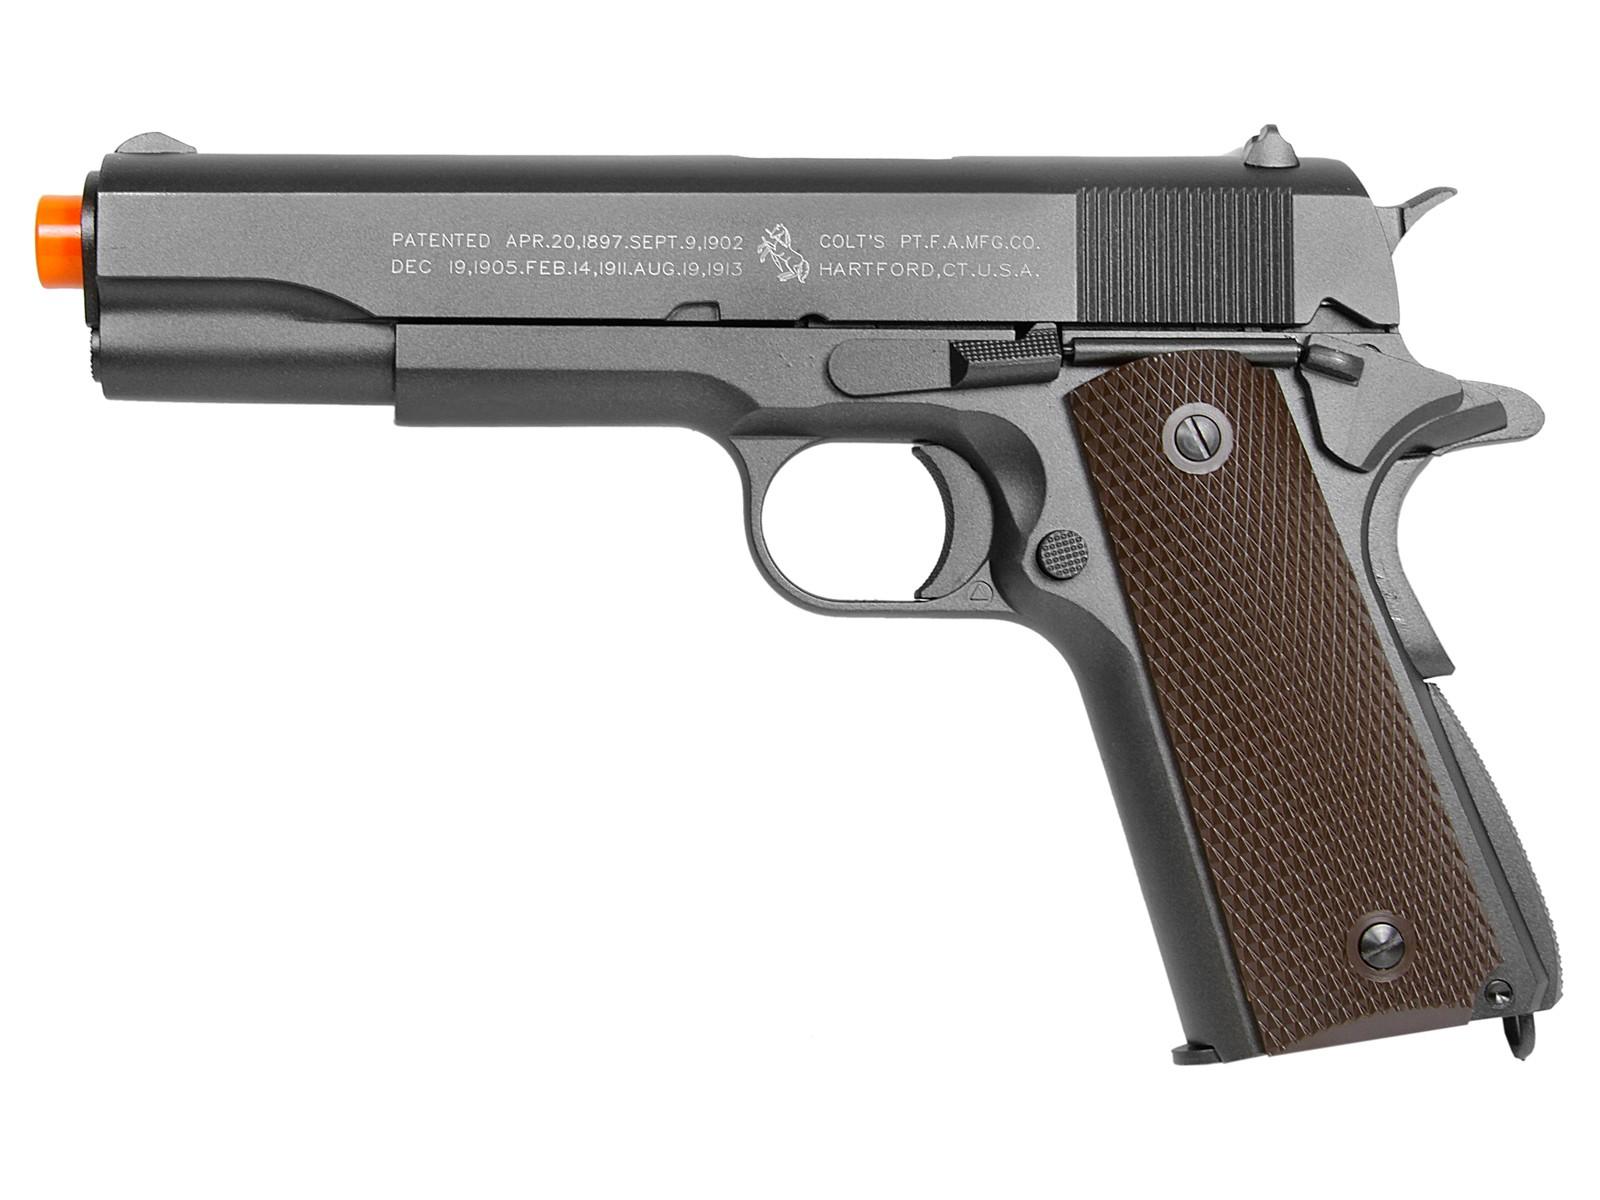 Colt_1911_CO2_Blowback_Metal_Airsoft_Pistol_Canada_Legal_6mm